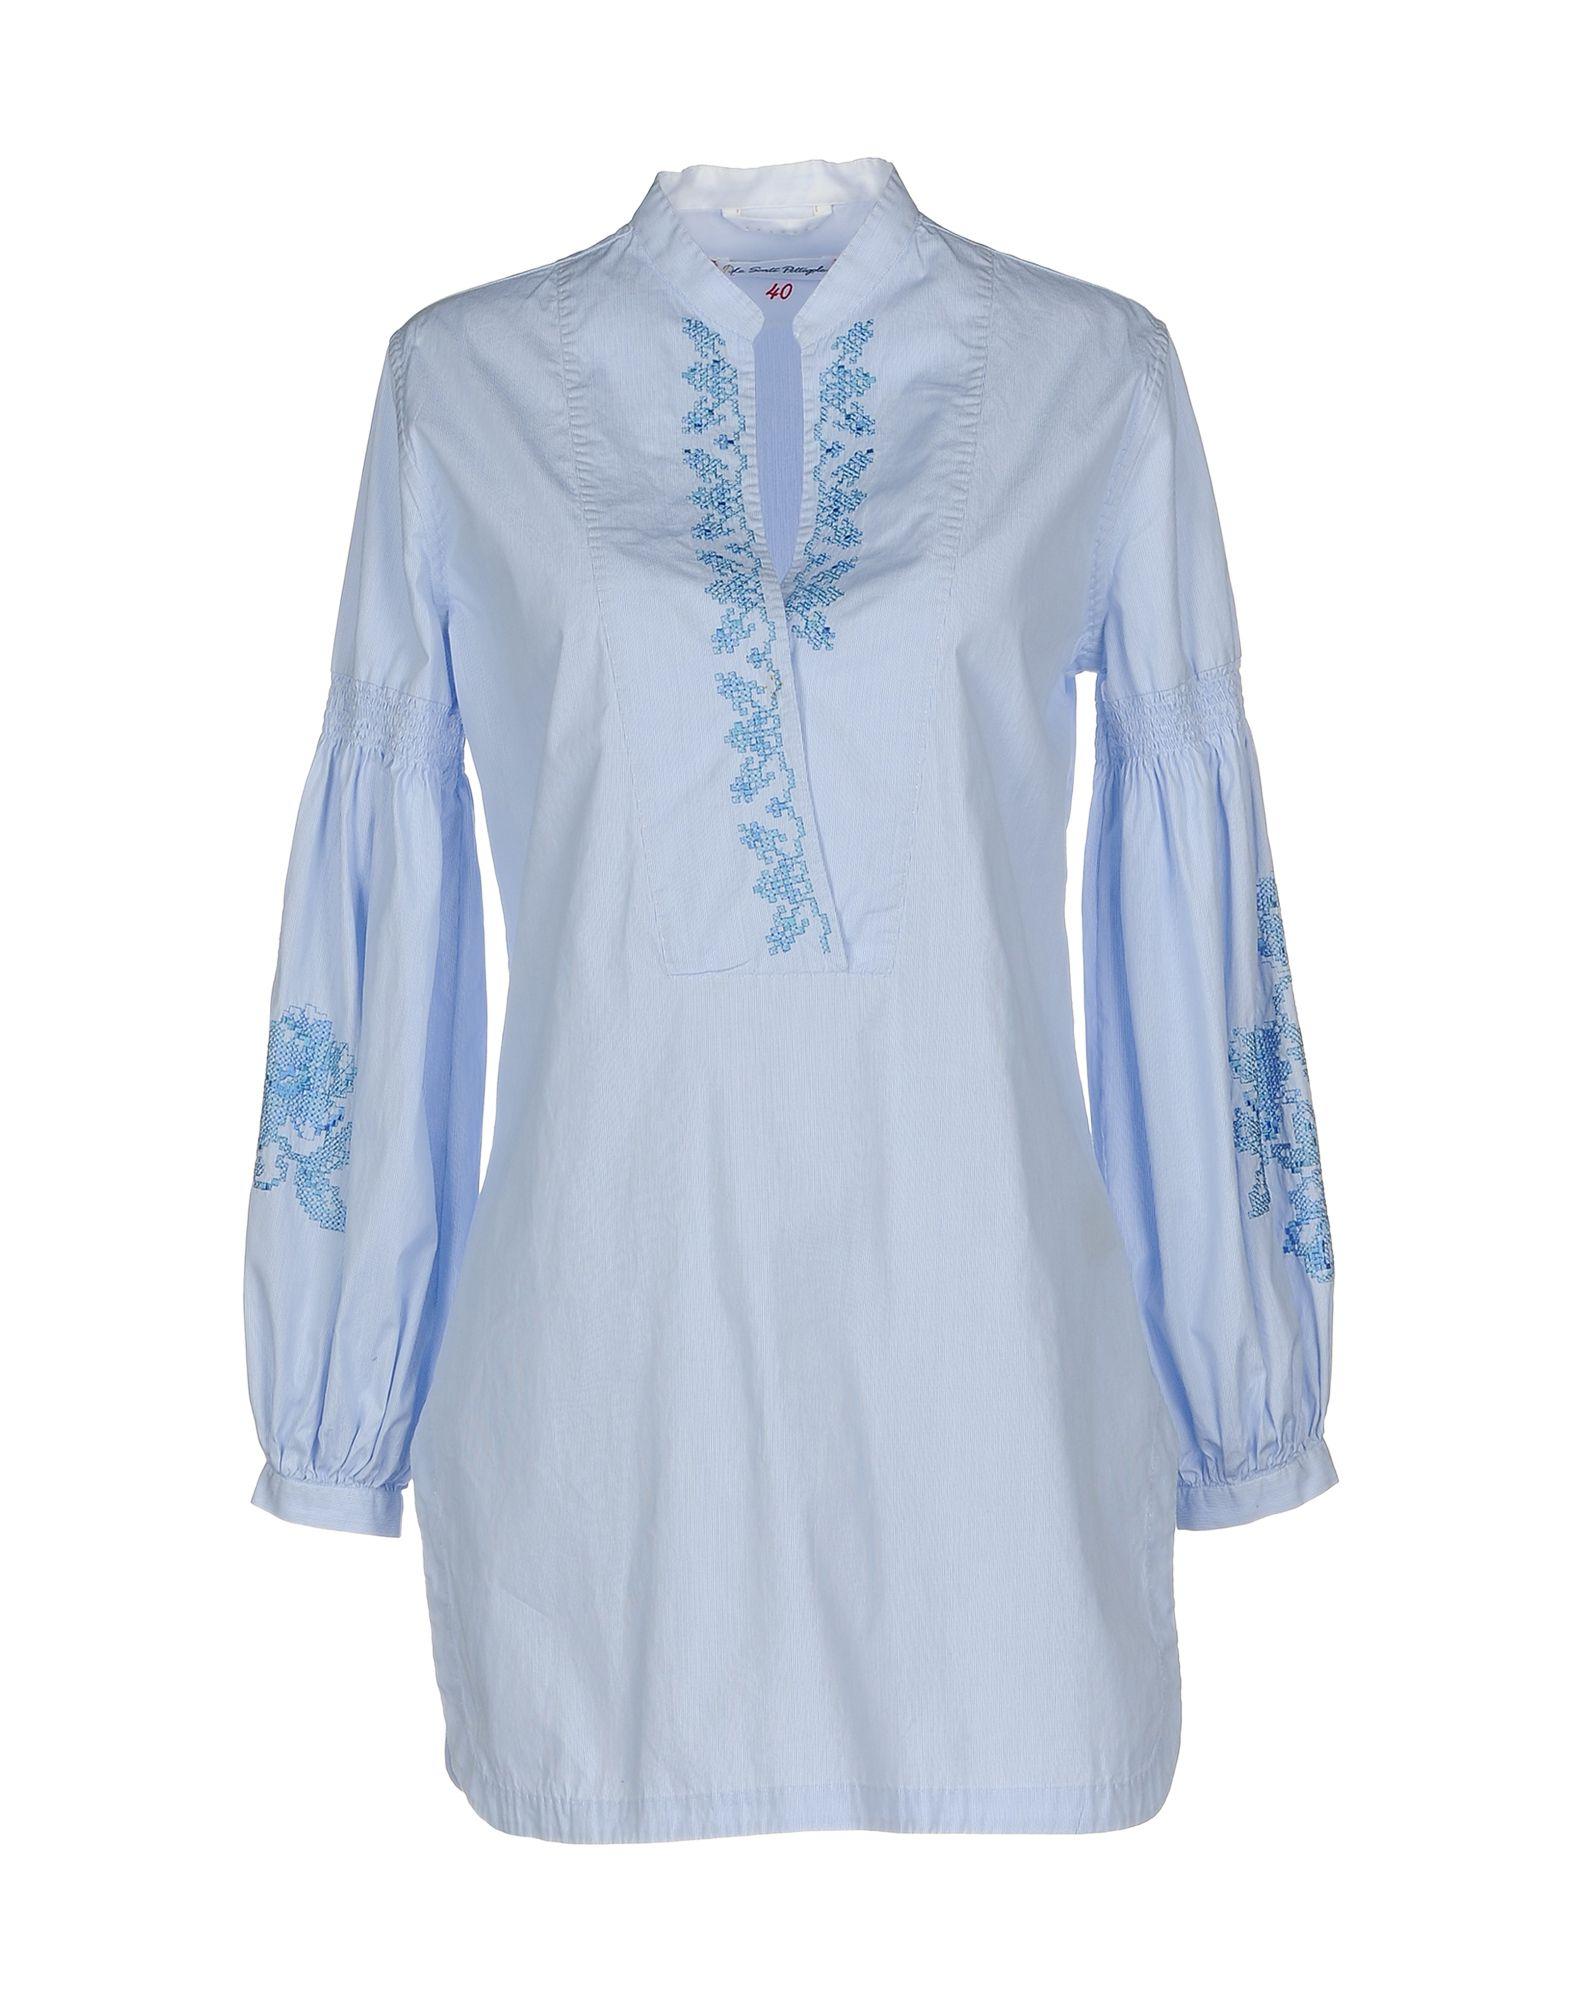 LE SARTE PETTEGOLE Damen Hemd Farbe Himmelblau Größe 6